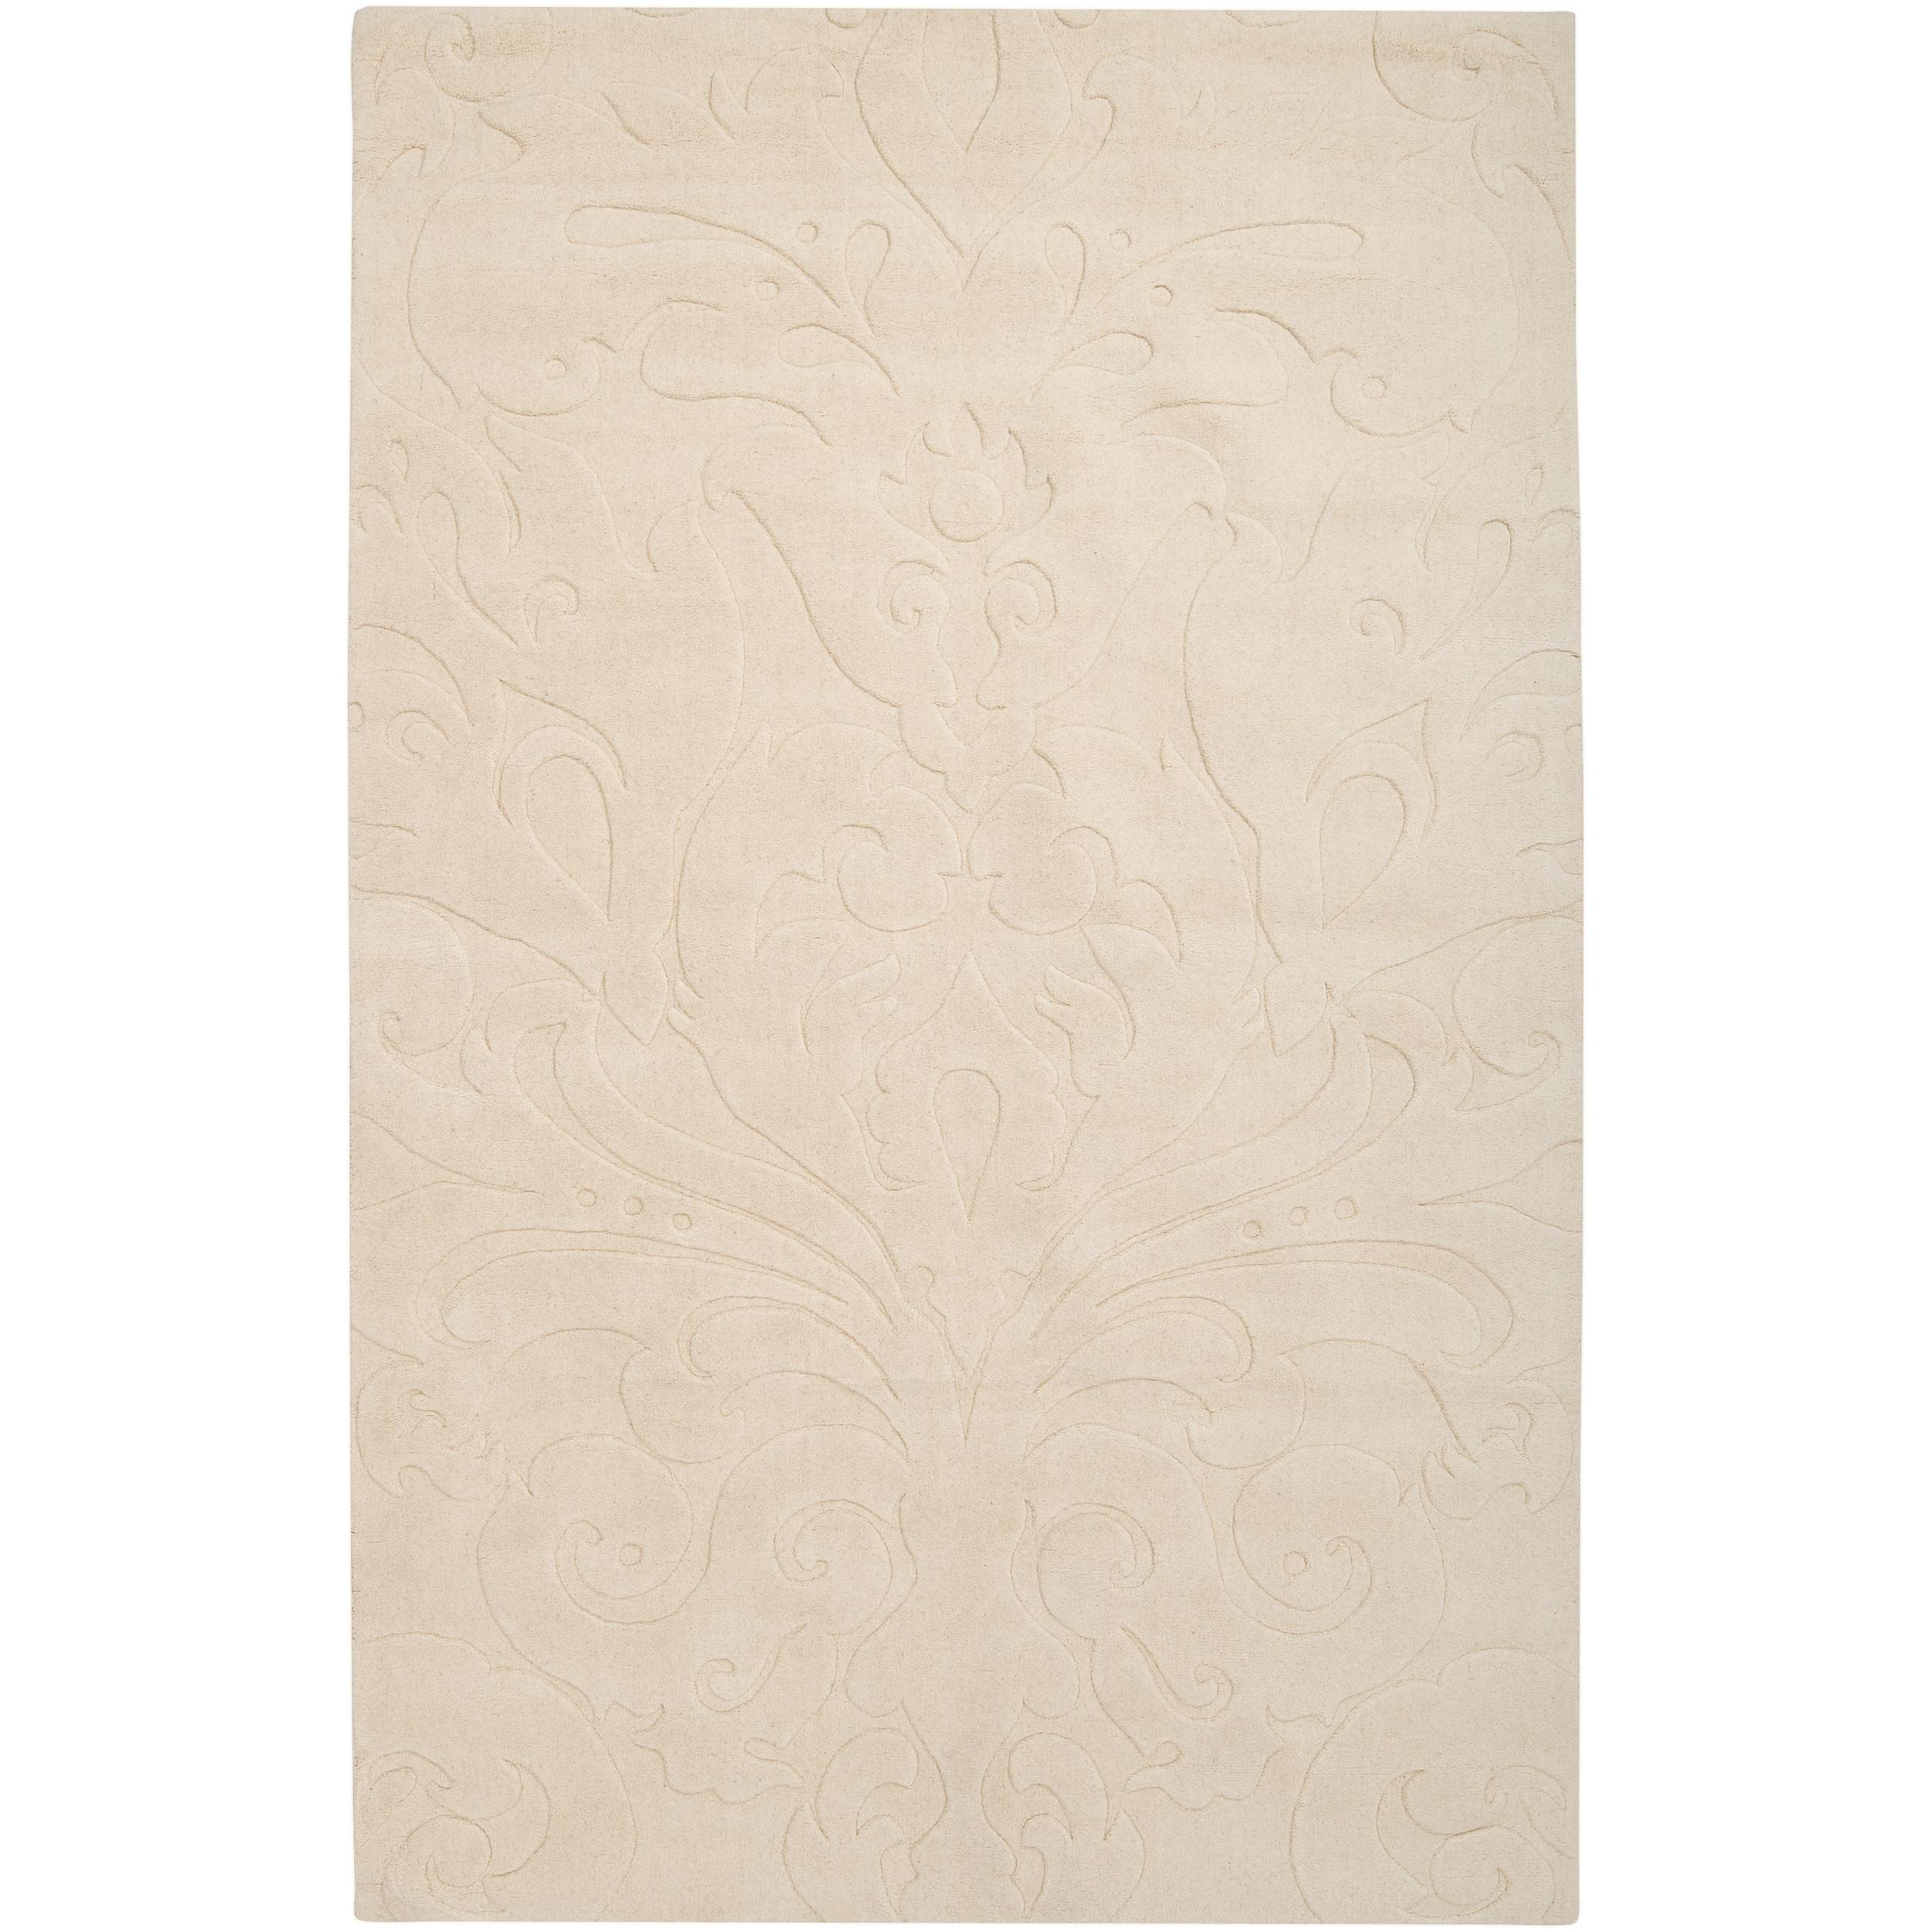 Candice Olson Loomed Ivory Vibora Damask Pattern Wool Rug (8' x 11')